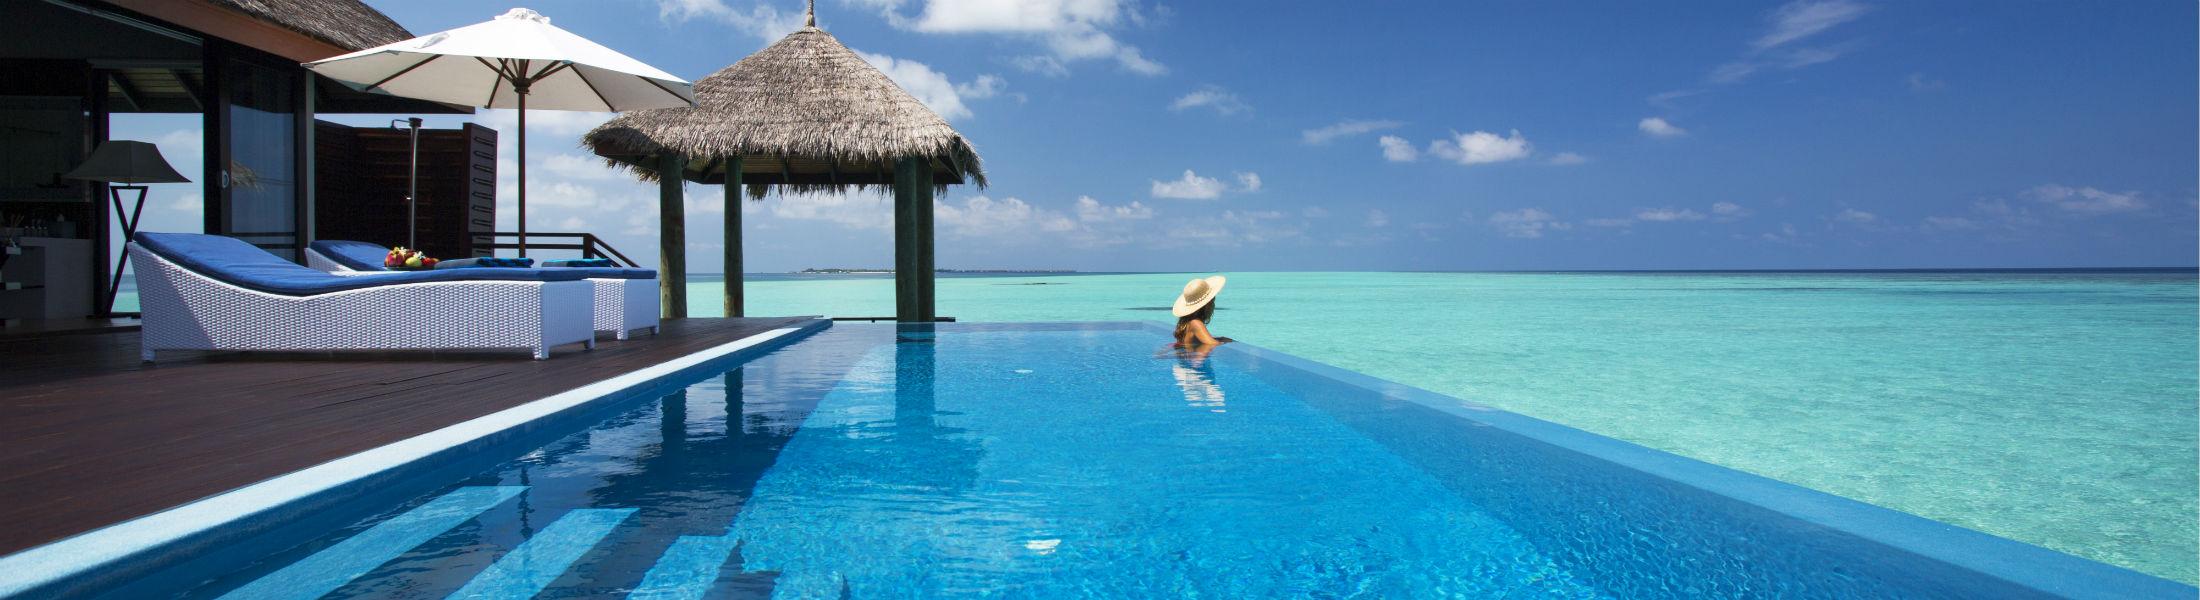 Water Suite pool, Velassaru Maldives